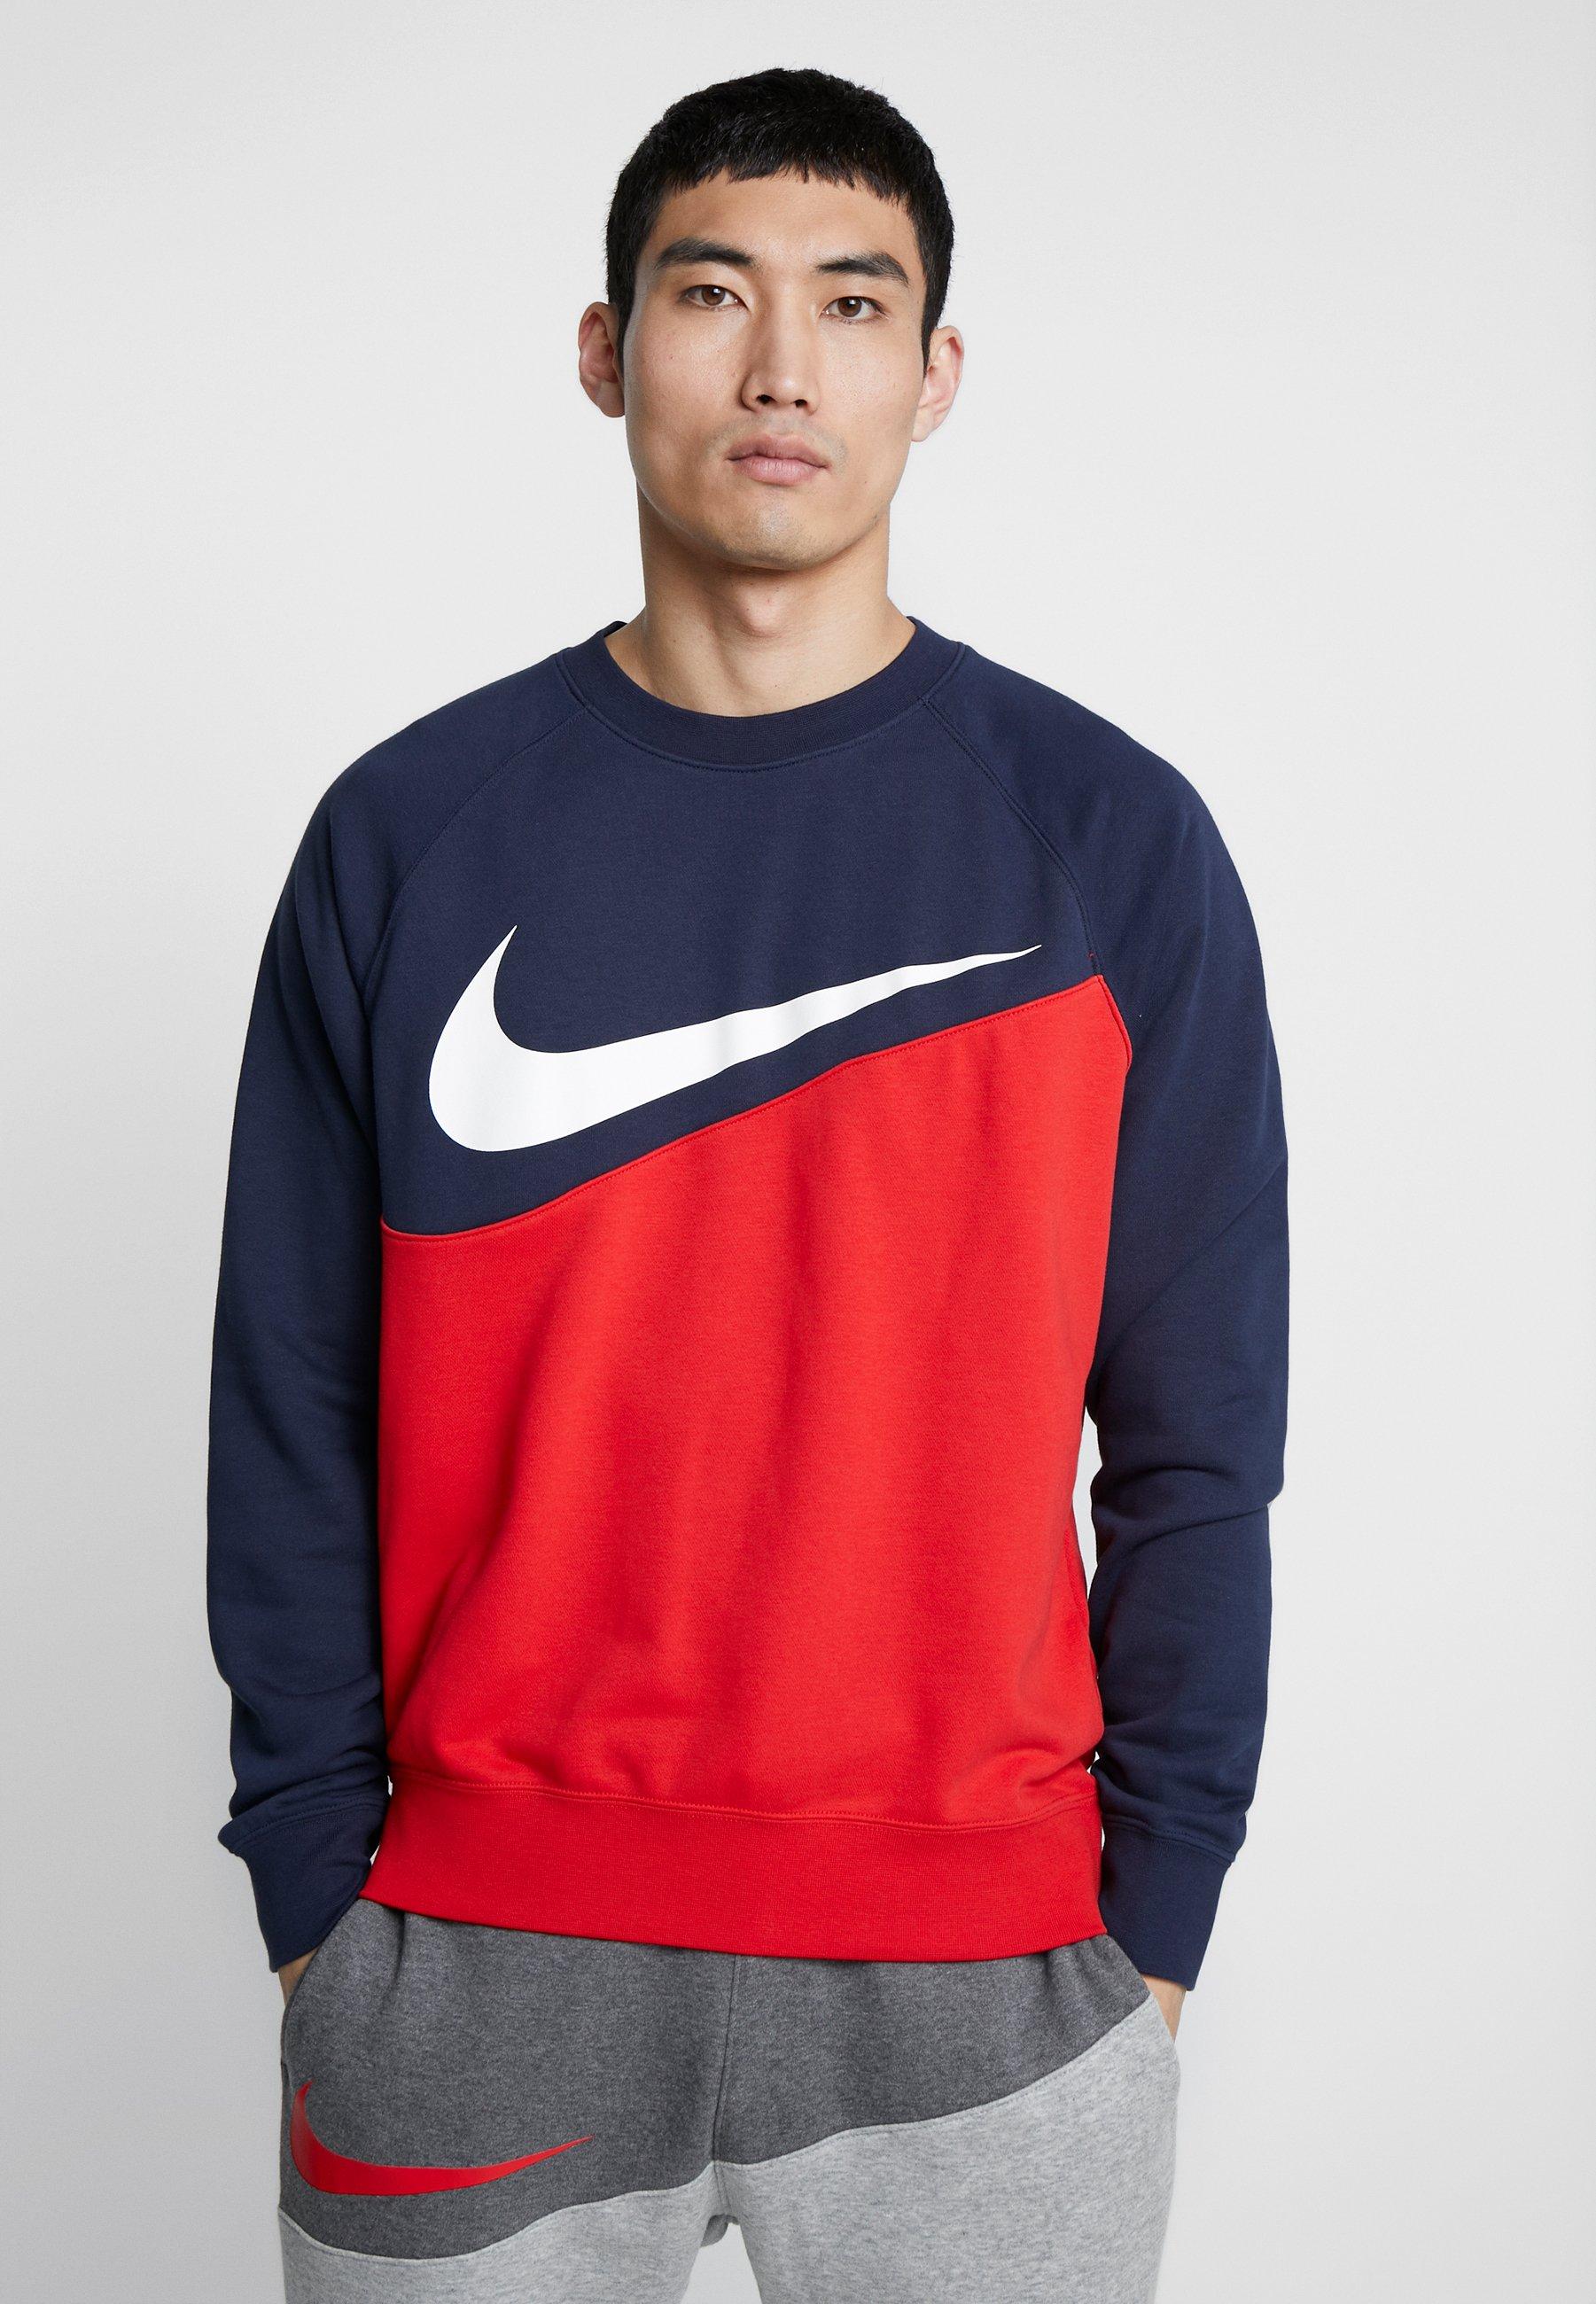 Nike University CrewSweatshirt obsidian Sportswear Red 92YWEHID